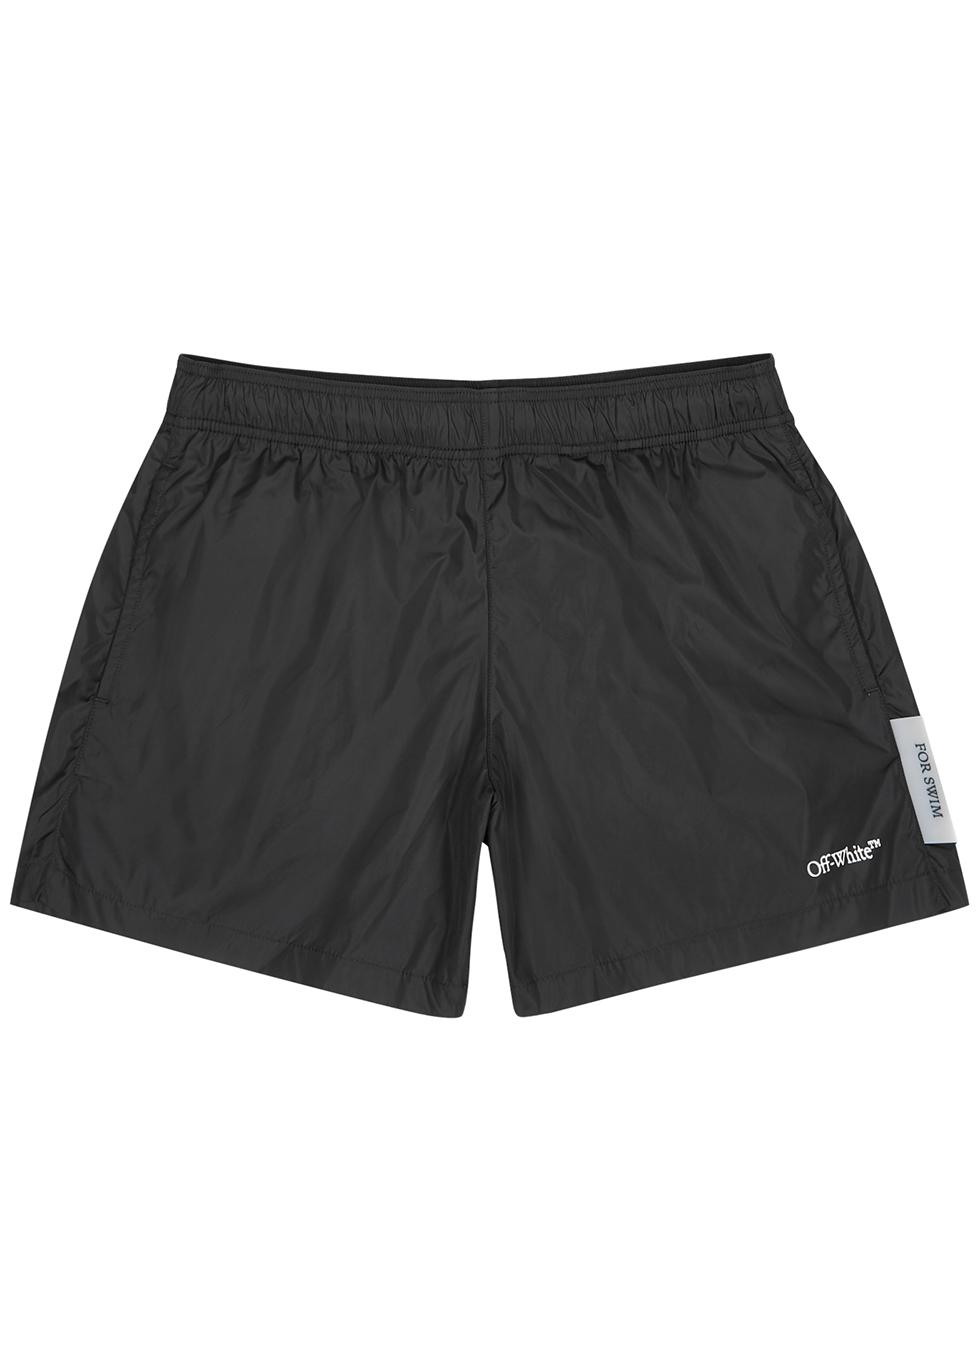 Black shell swim shorts